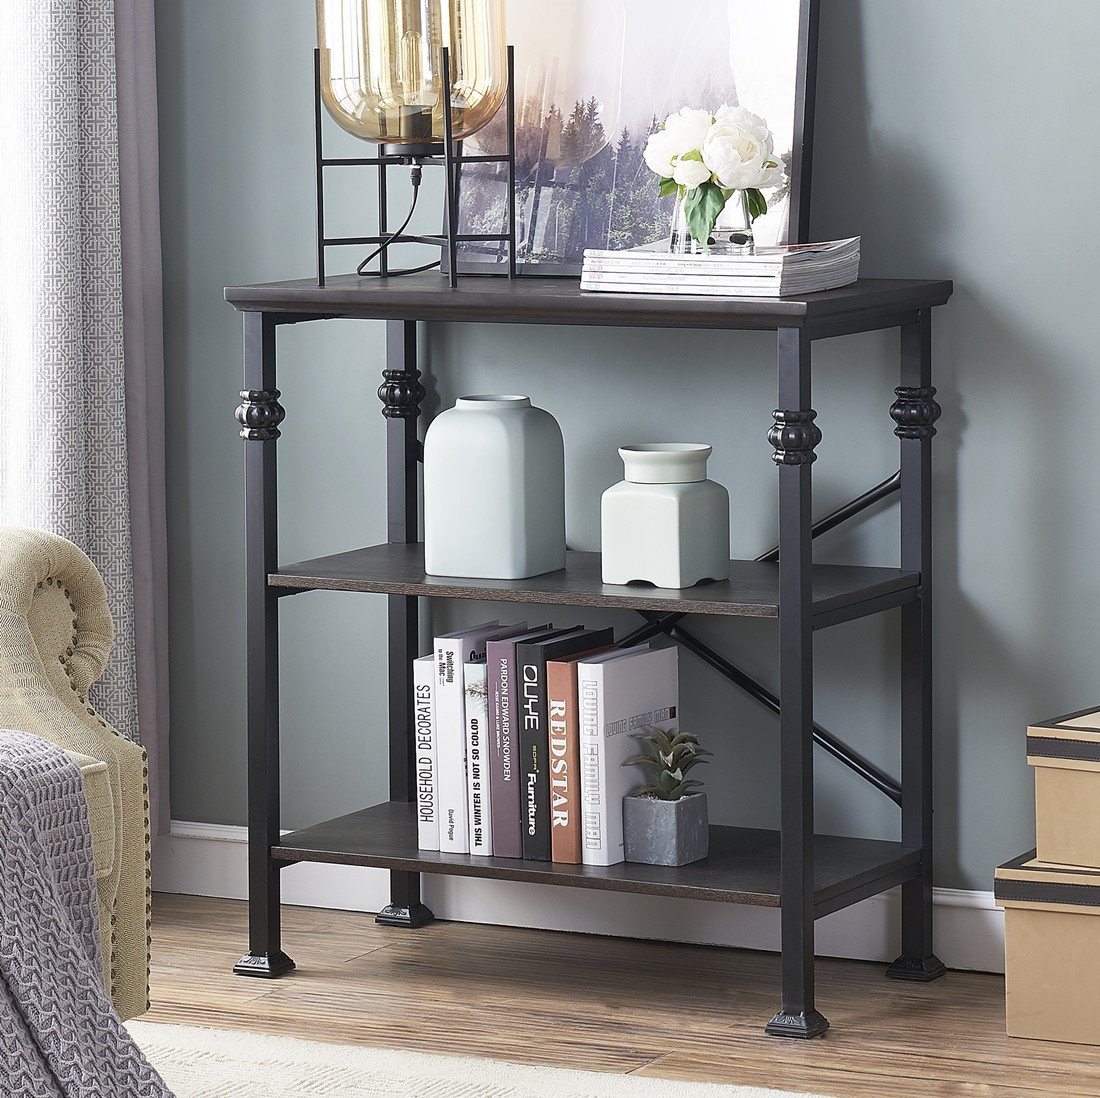 O&K Furniture 3-Shelf Industrial Wood and Metal Bookcase, Etagere Bookshelf for Living Room, Black-Espresso